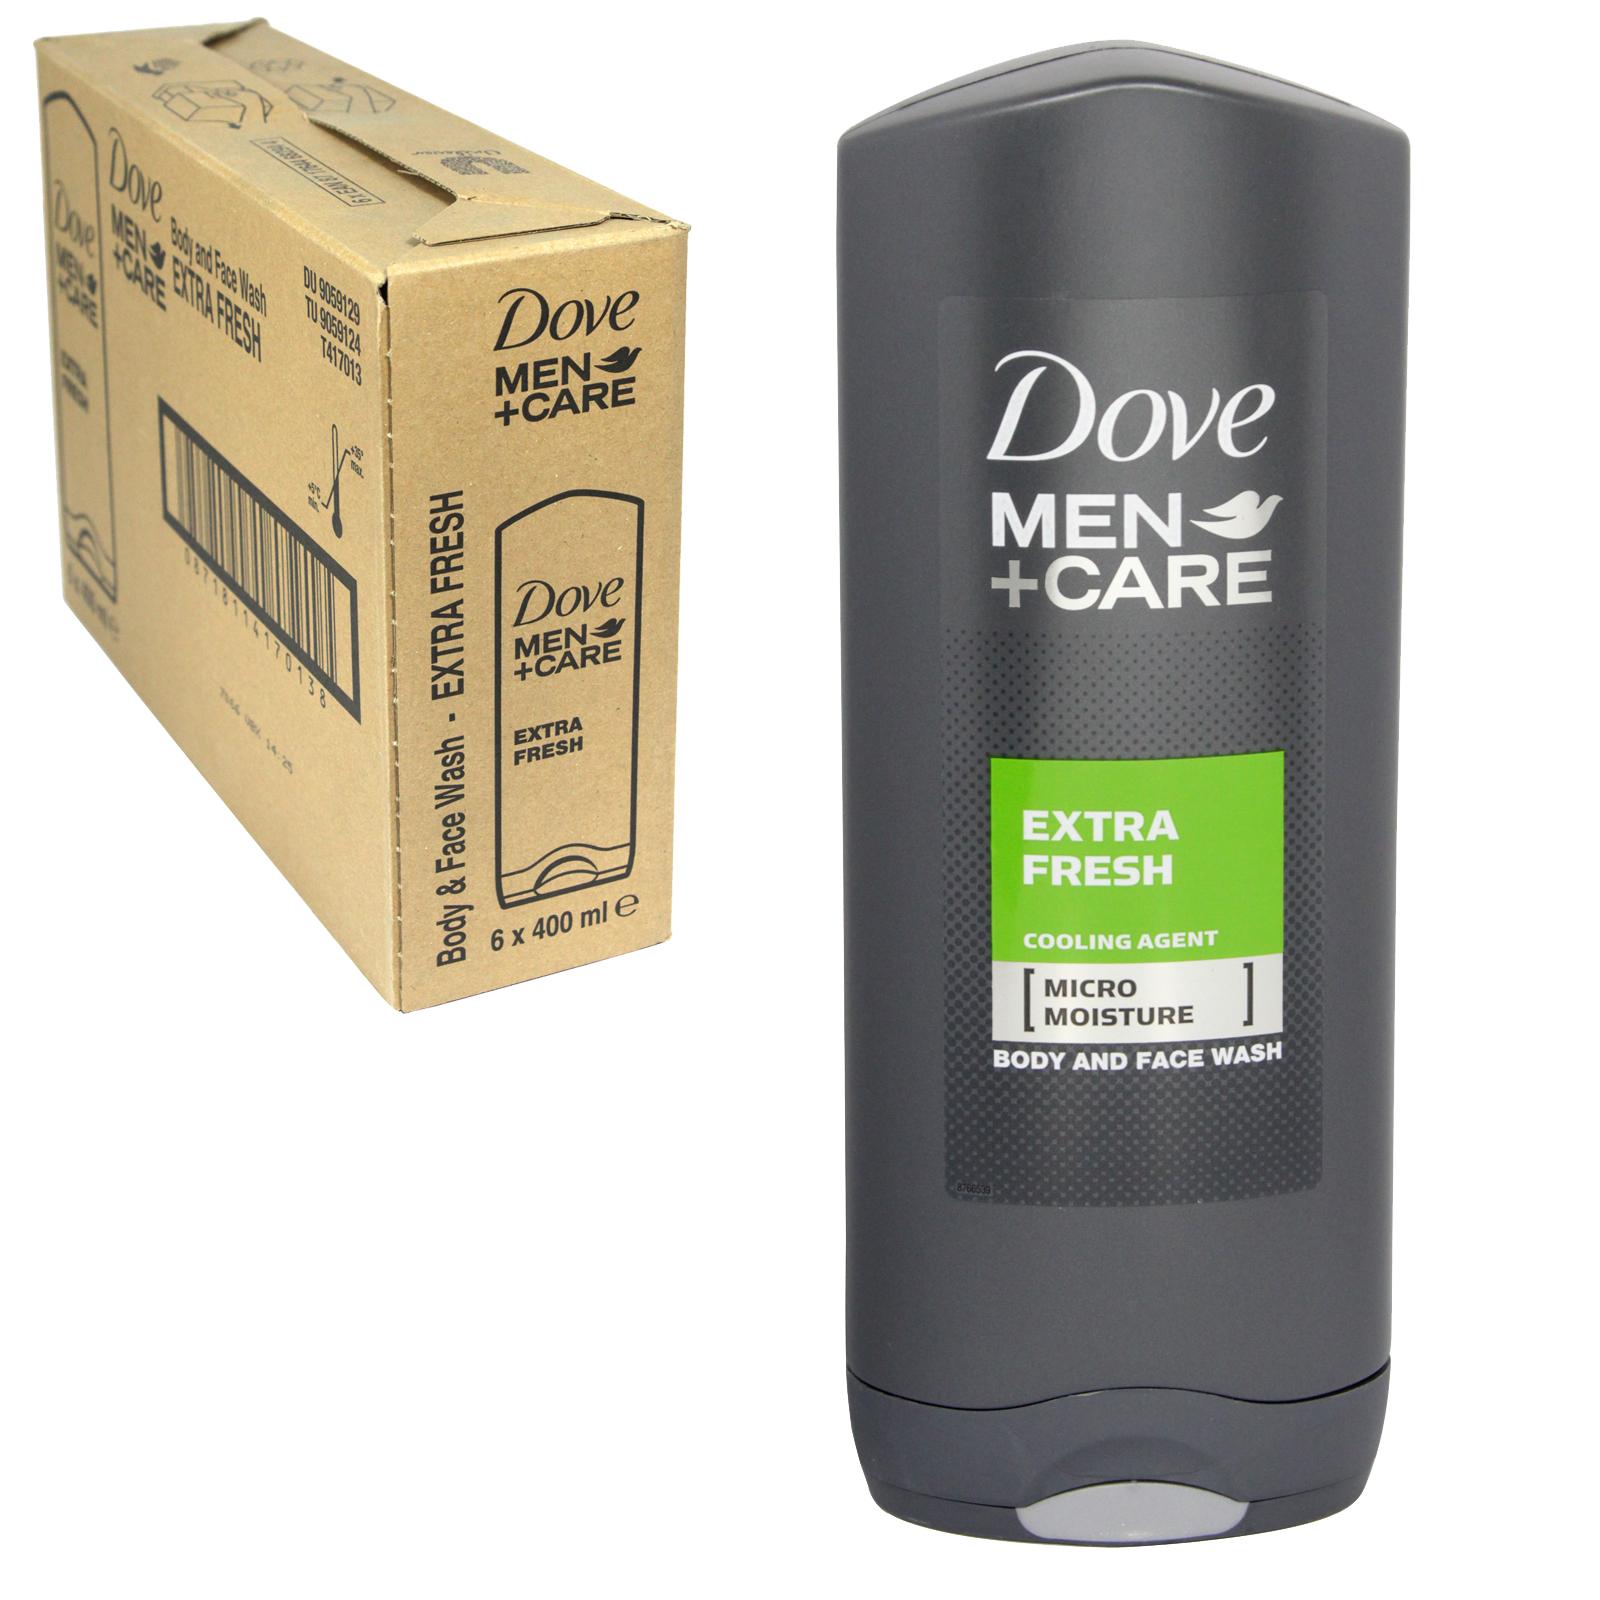 DOVE MEN+CARE 400ML FACE+BODY WASH EXTRA FRESH X 6